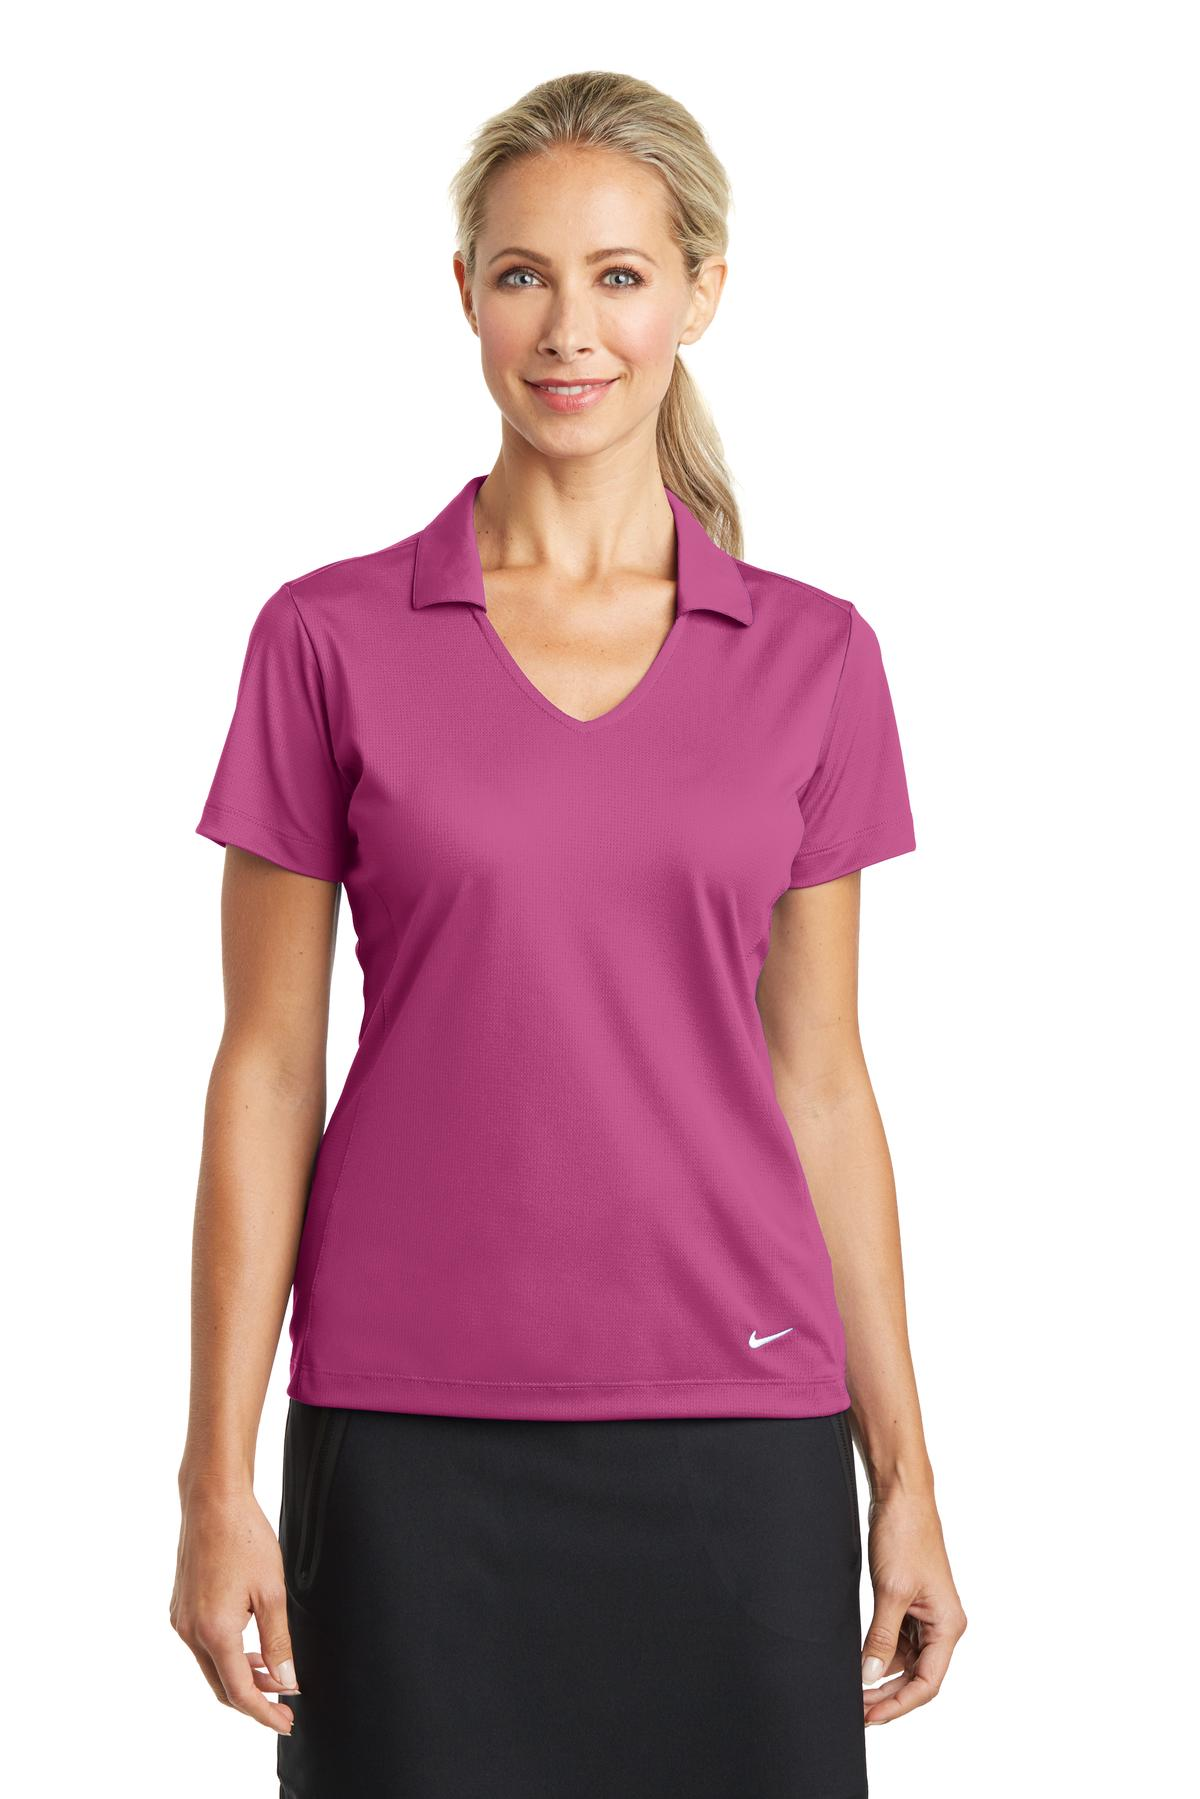 Nike golf 637165 ladies dri fit vertical mesh polo for Nike dri fit t shirt ladies